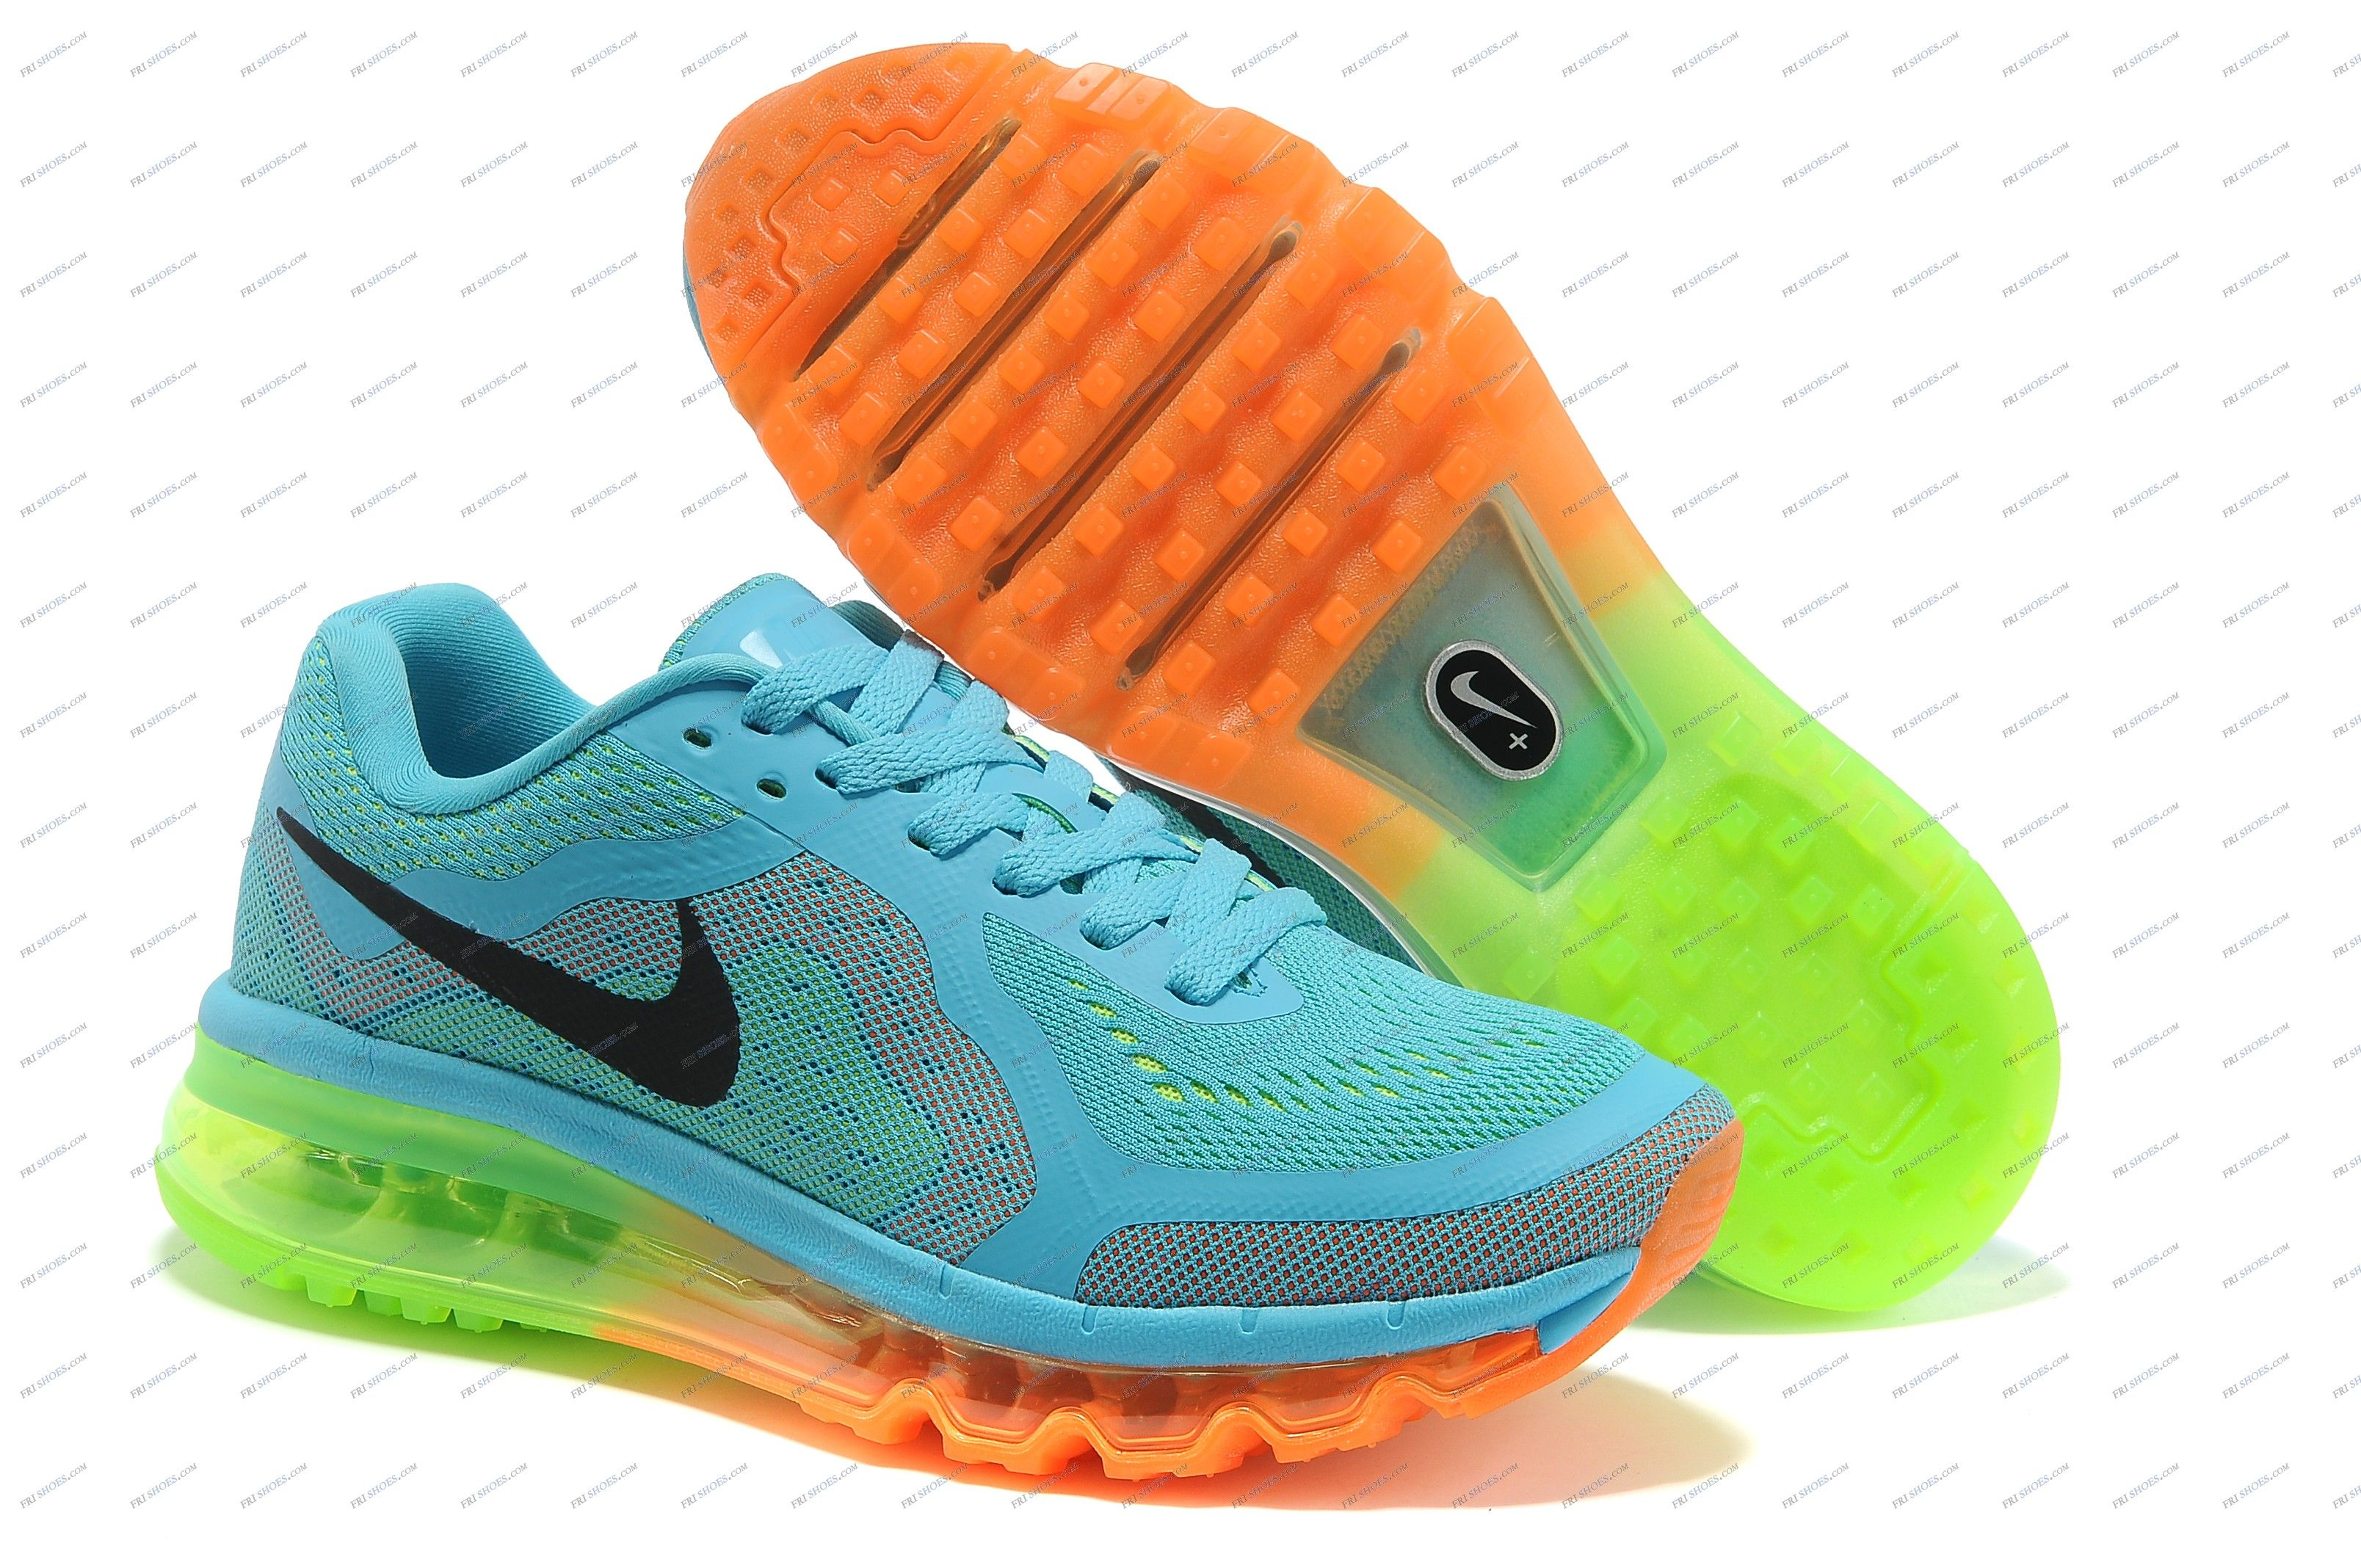 Nike Air Max 2014 Sports Shoes Sky Blue